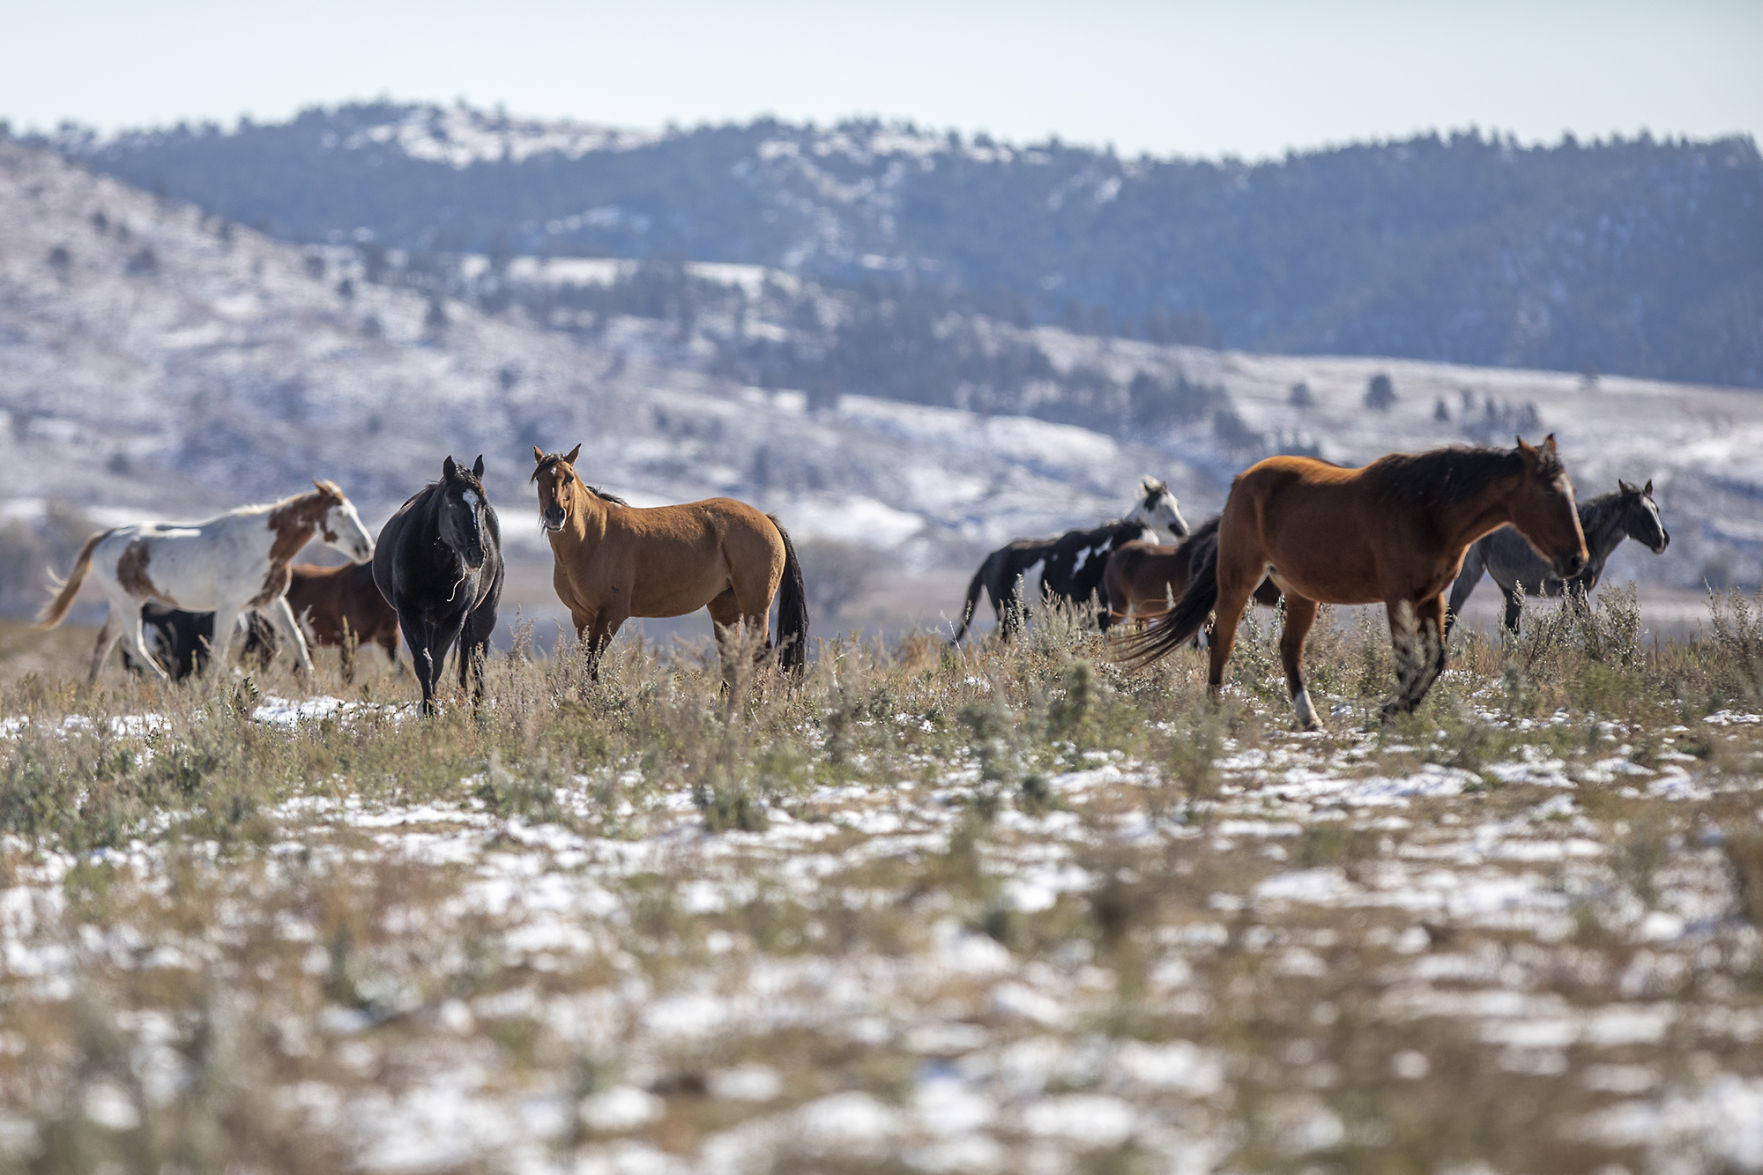 Horse Sanctuary Loses Lawsuit Against Nature Conservancy Local Rapidcityjournal Com